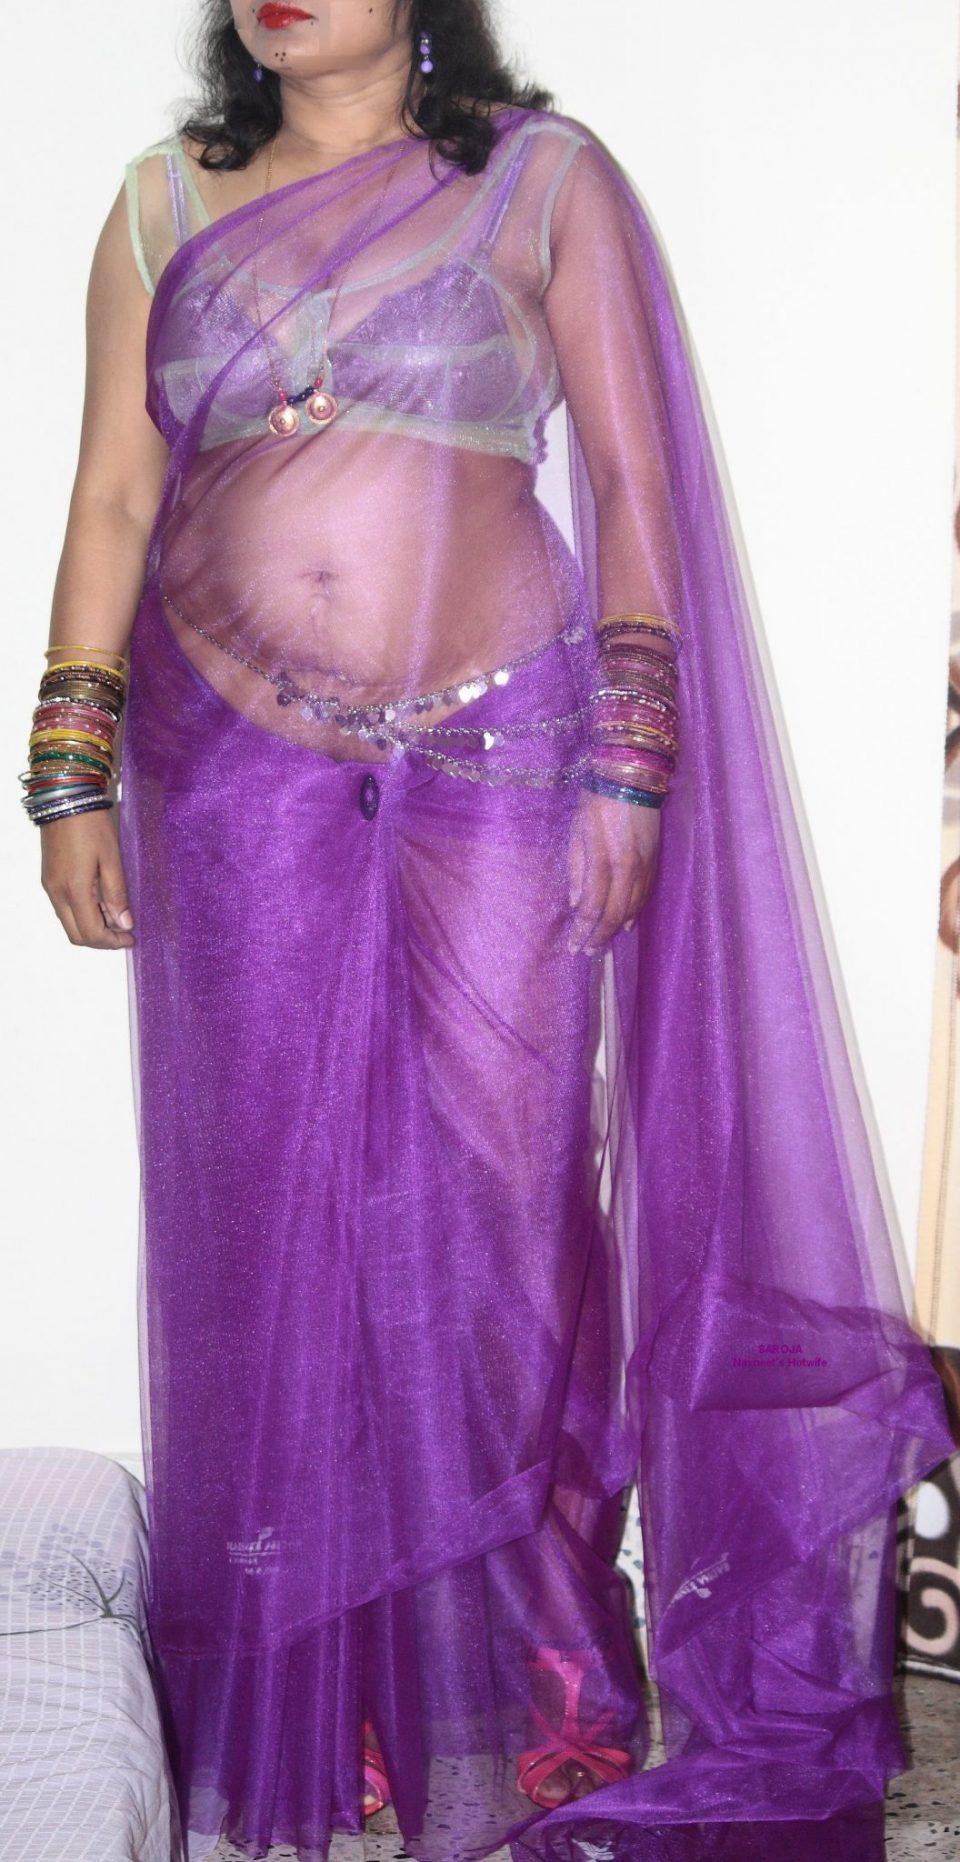 Tamil Aunty Transparent Saree Bra Images  Indian Sex Gallery-2510